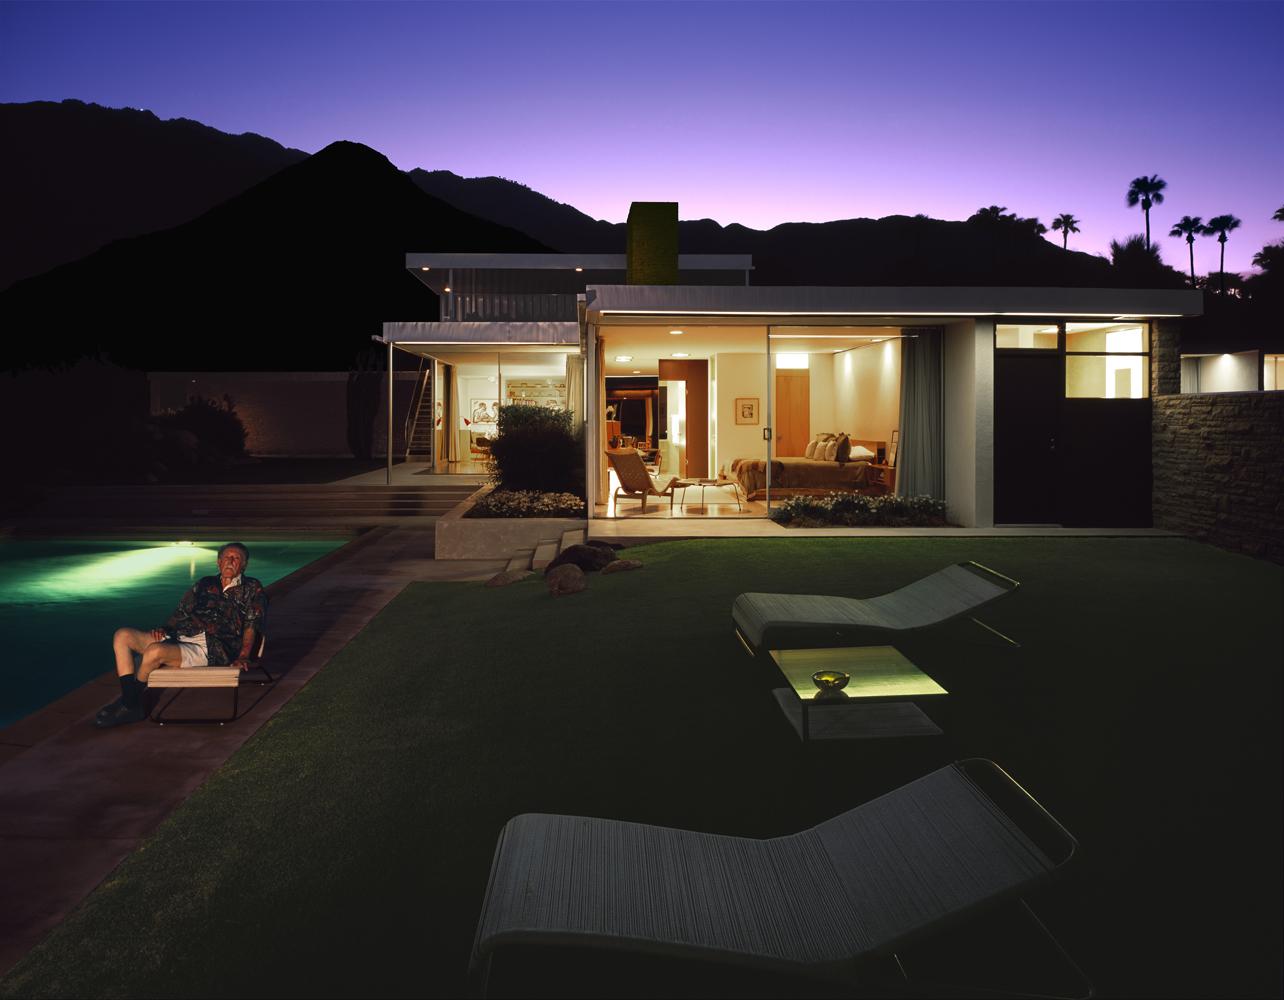 Julius Shulman with the Kaufmann House, Palm Springs, CA. 2007 Richard Neutra, architect